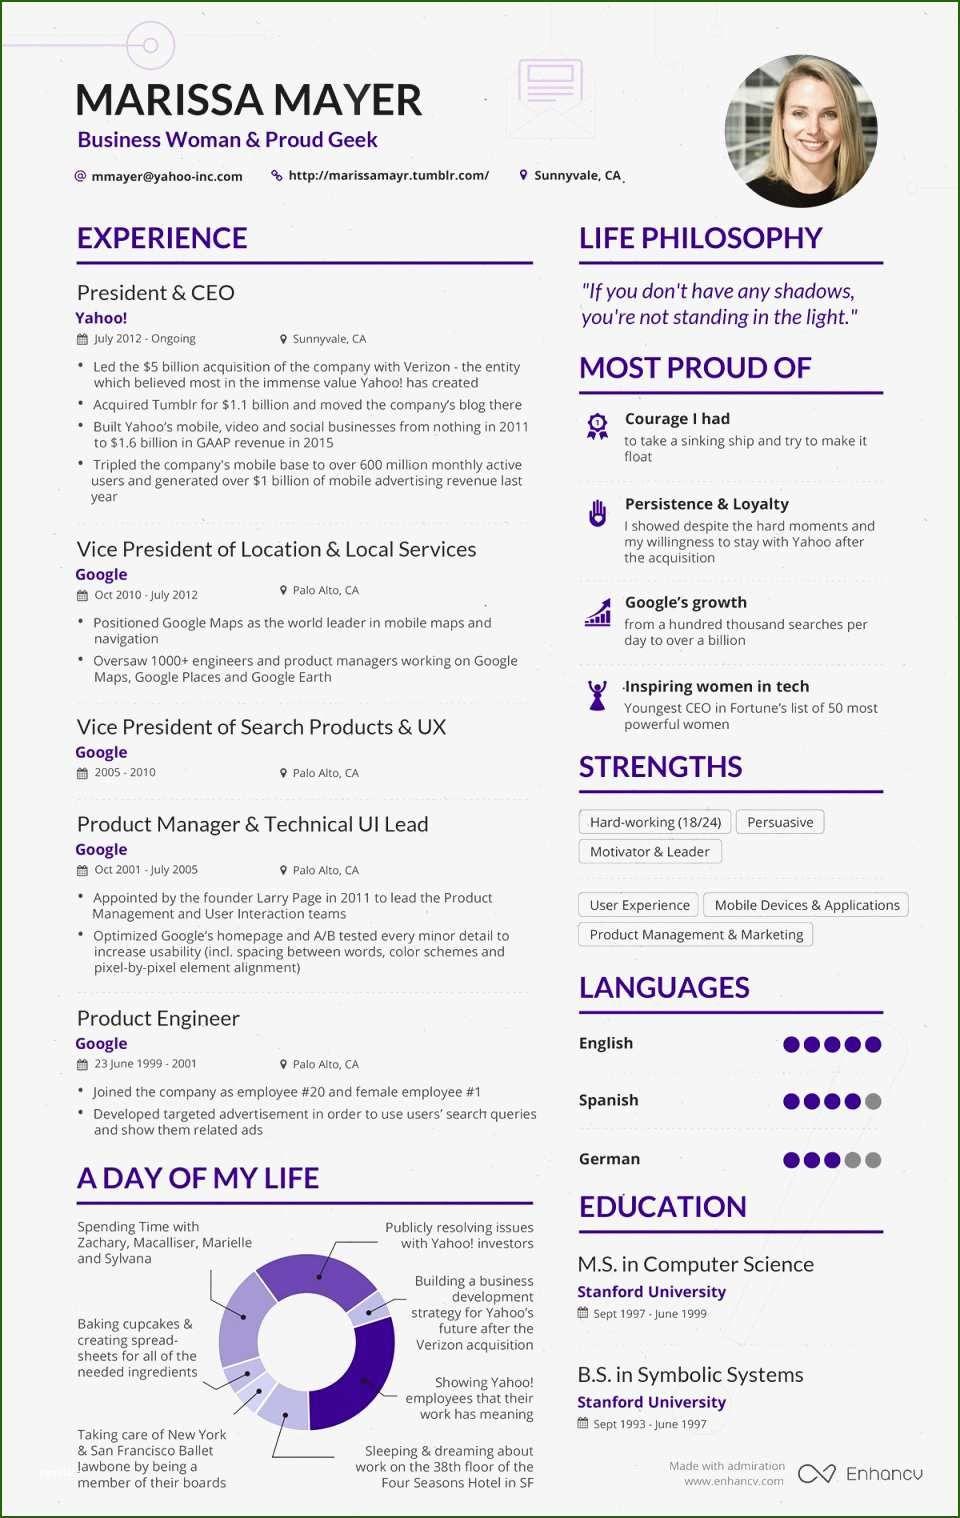 18 Admirable Marissa Mayer Resume Template Marissa Mayer Infographic Resume Cv Words